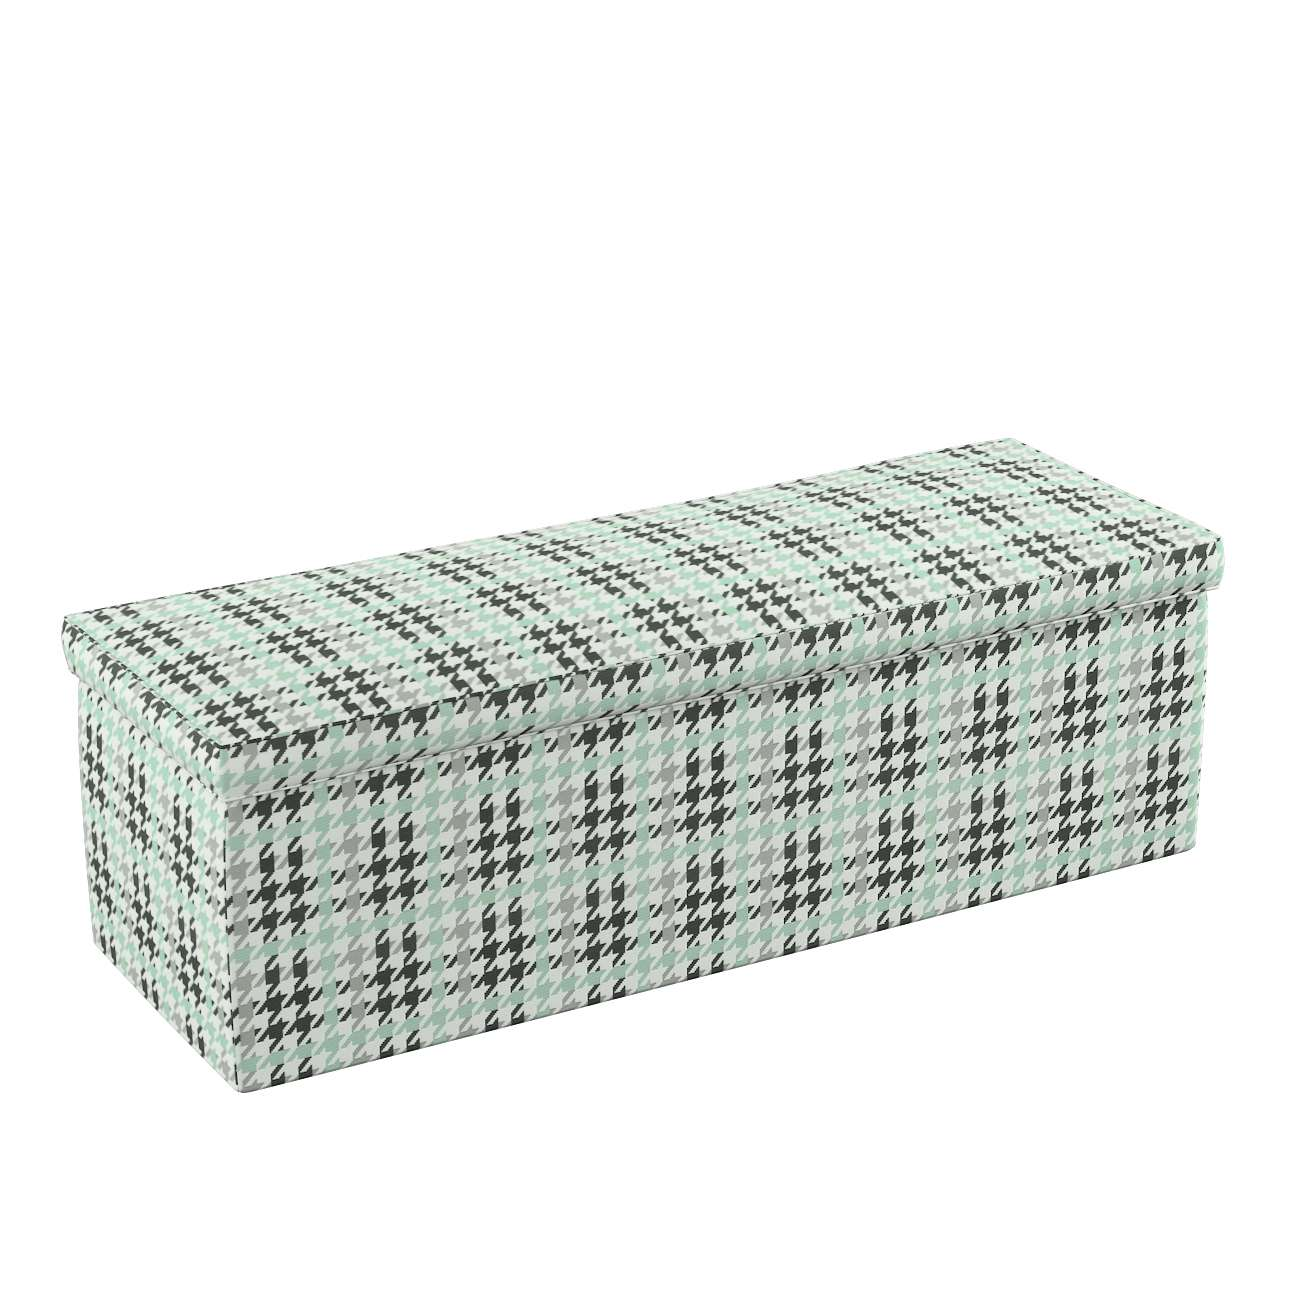 truhen online kaufen m bel suchmaschine. Black Bedroom Furniture Sets. Home Design Ideas